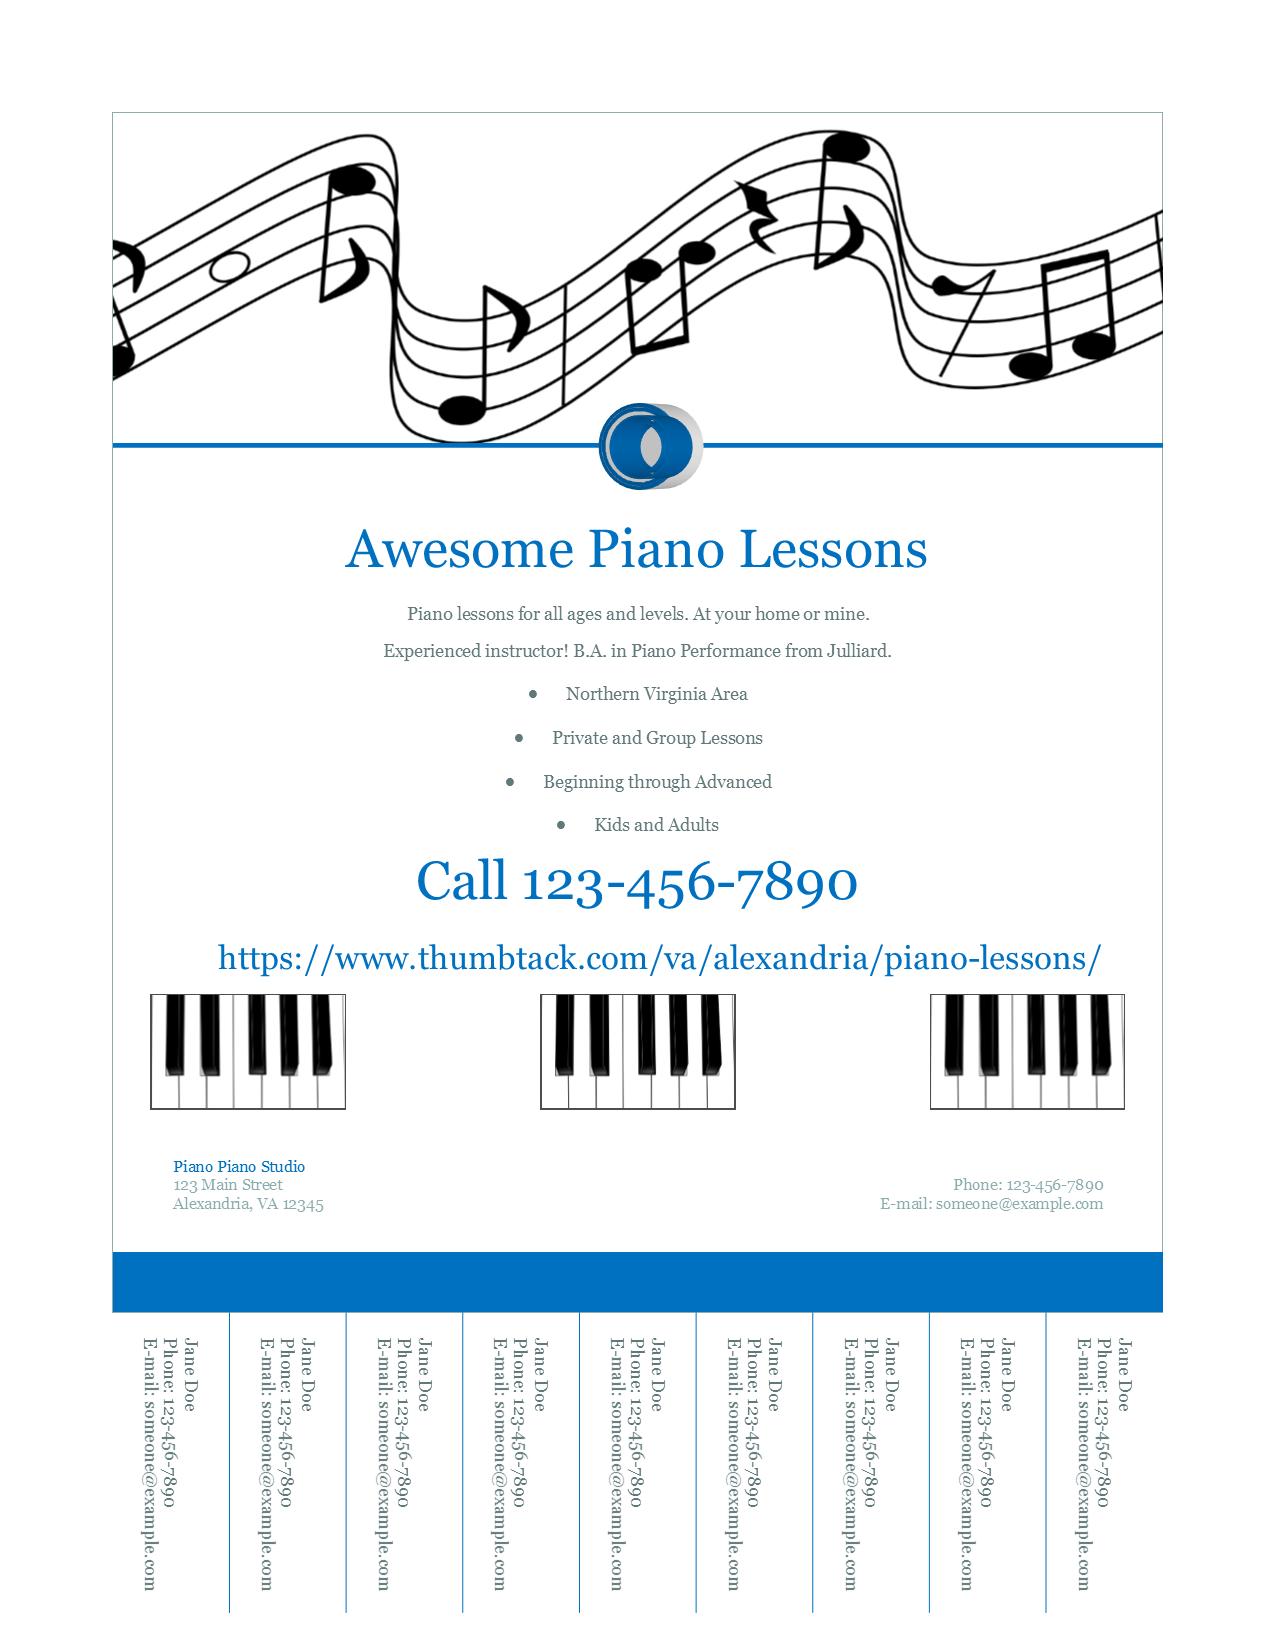 Mea Piano Studio Free Template Tear Off Flyer Mea Piano Studio